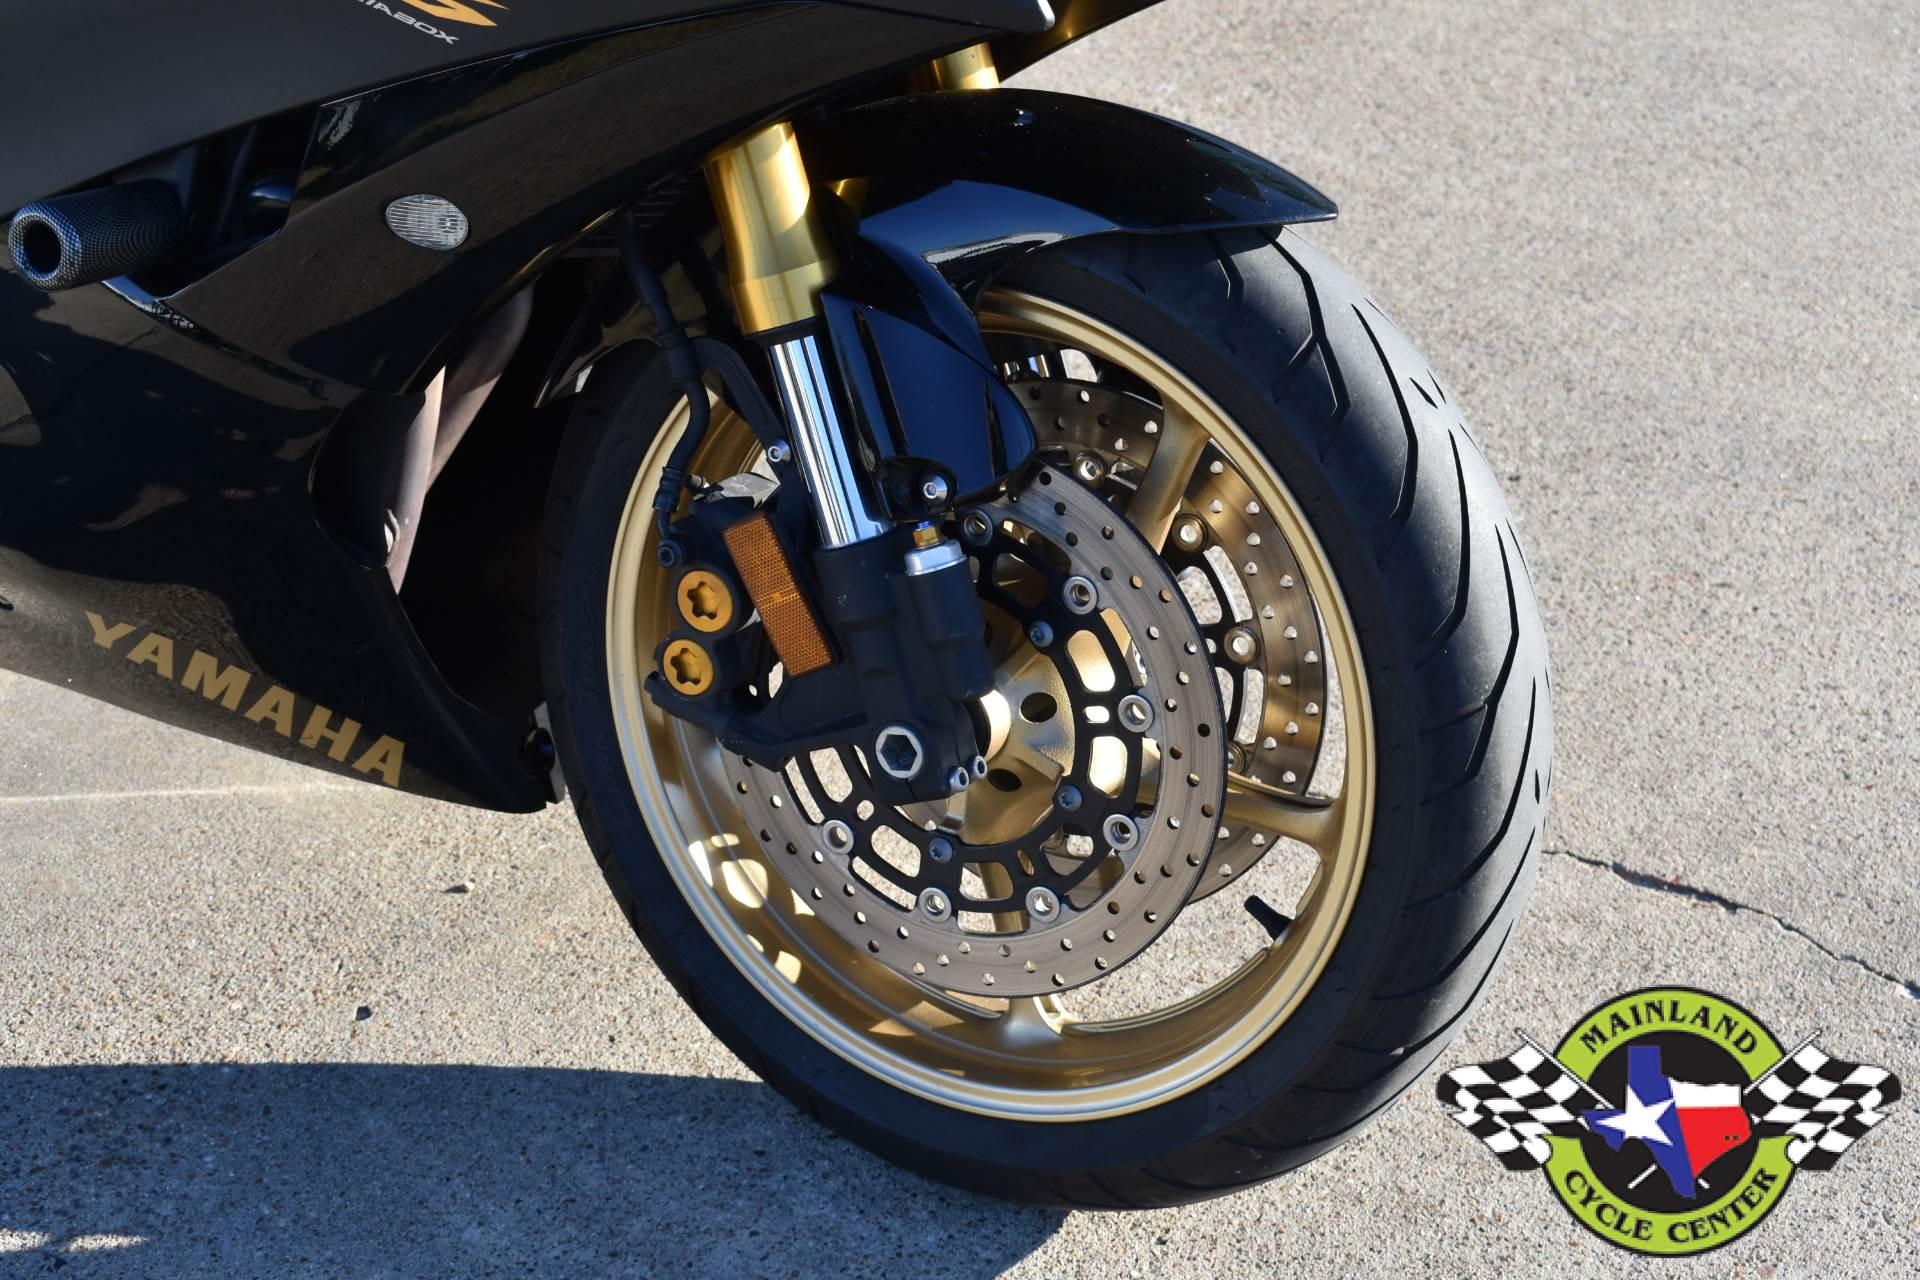 2009 Yamaha YZFR6 12